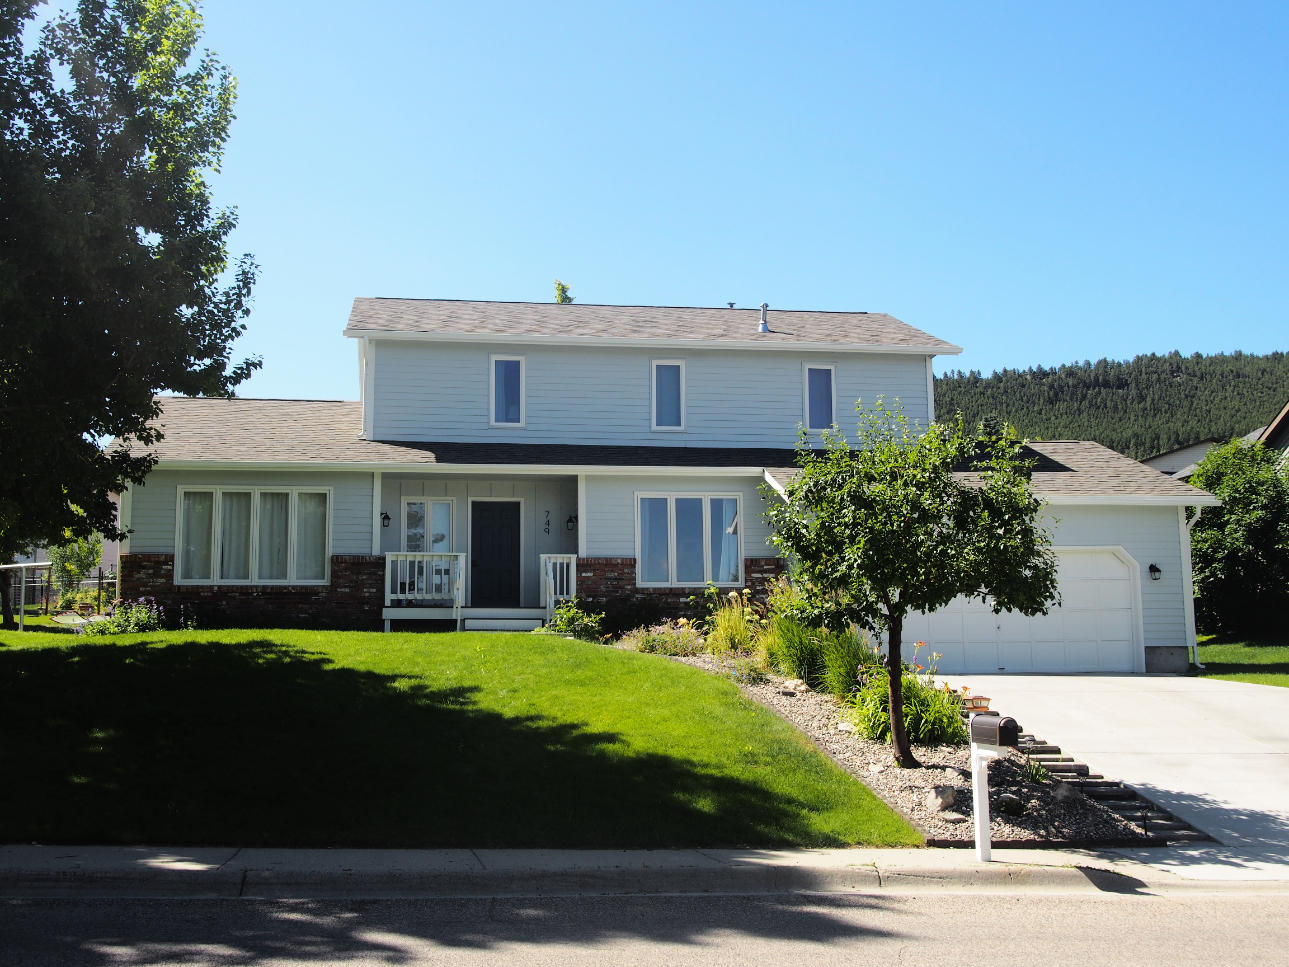 749 South California Street, Helena, MT 59601, MLS # 21912822 | Berkshire  Hathaway HomeServices Montana Properties